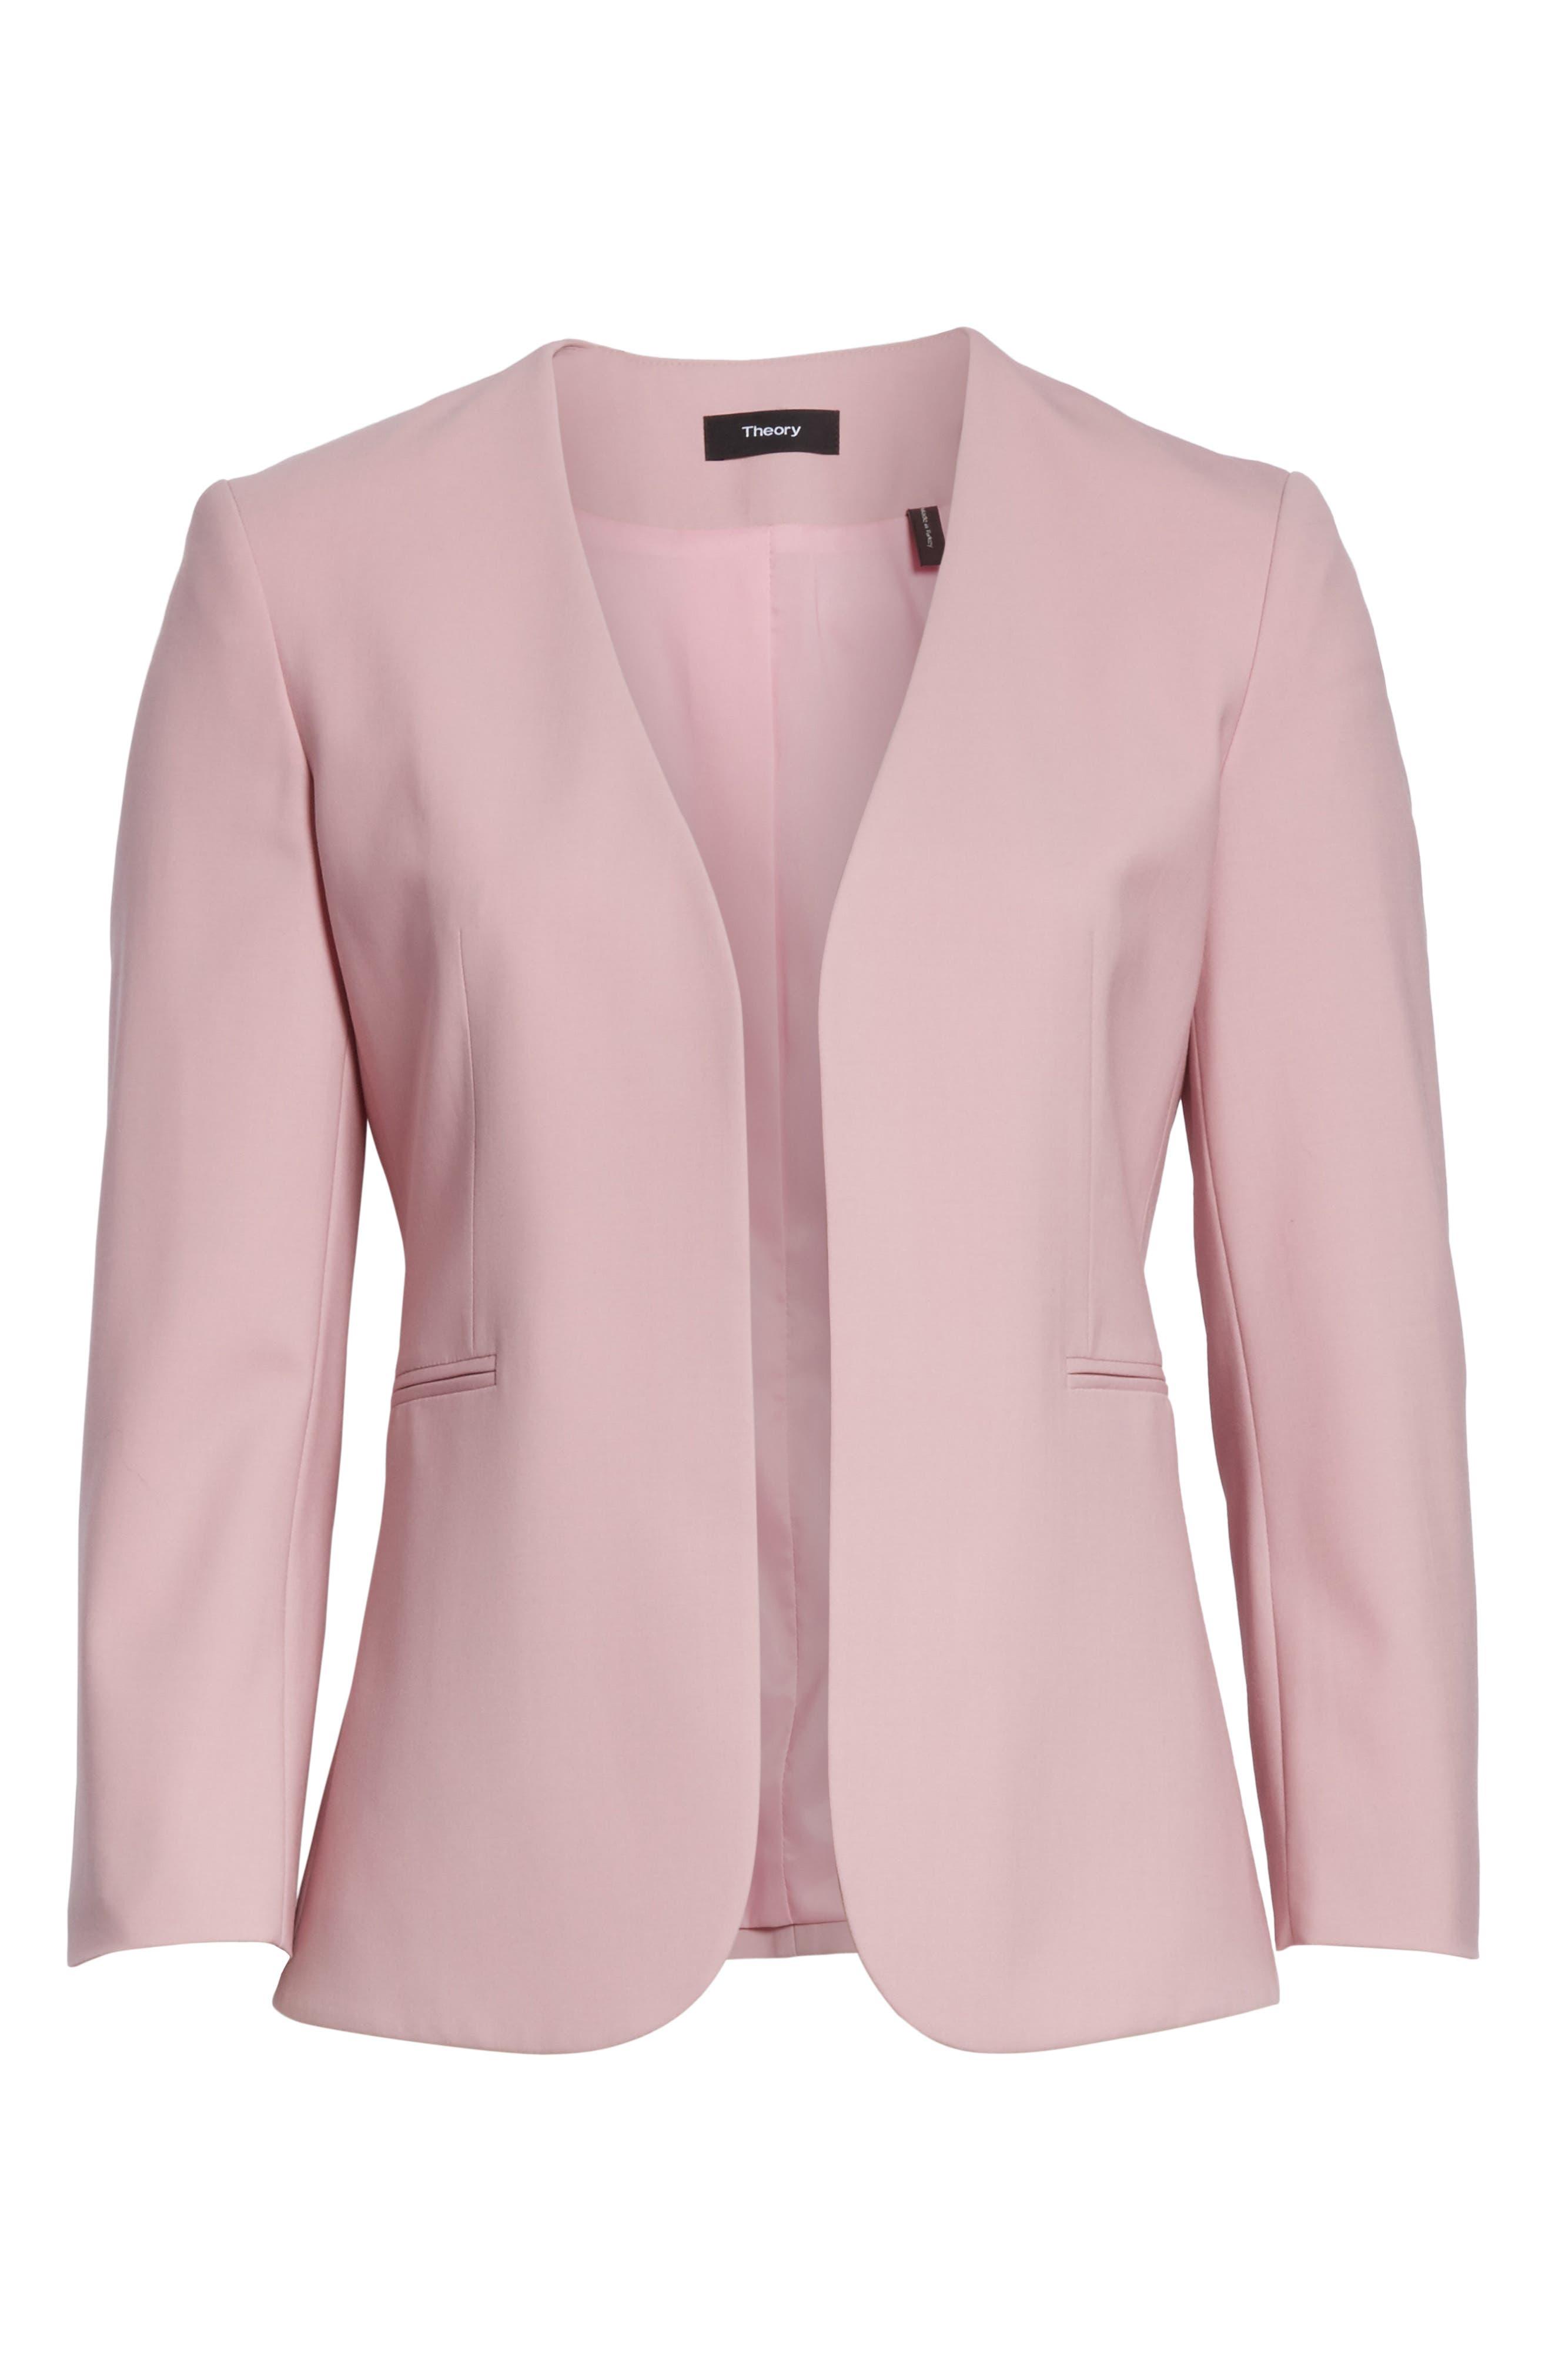 Lindrayia B Good Wool Suit Jacket,                             Alternate thumbnail 5, color,                             655